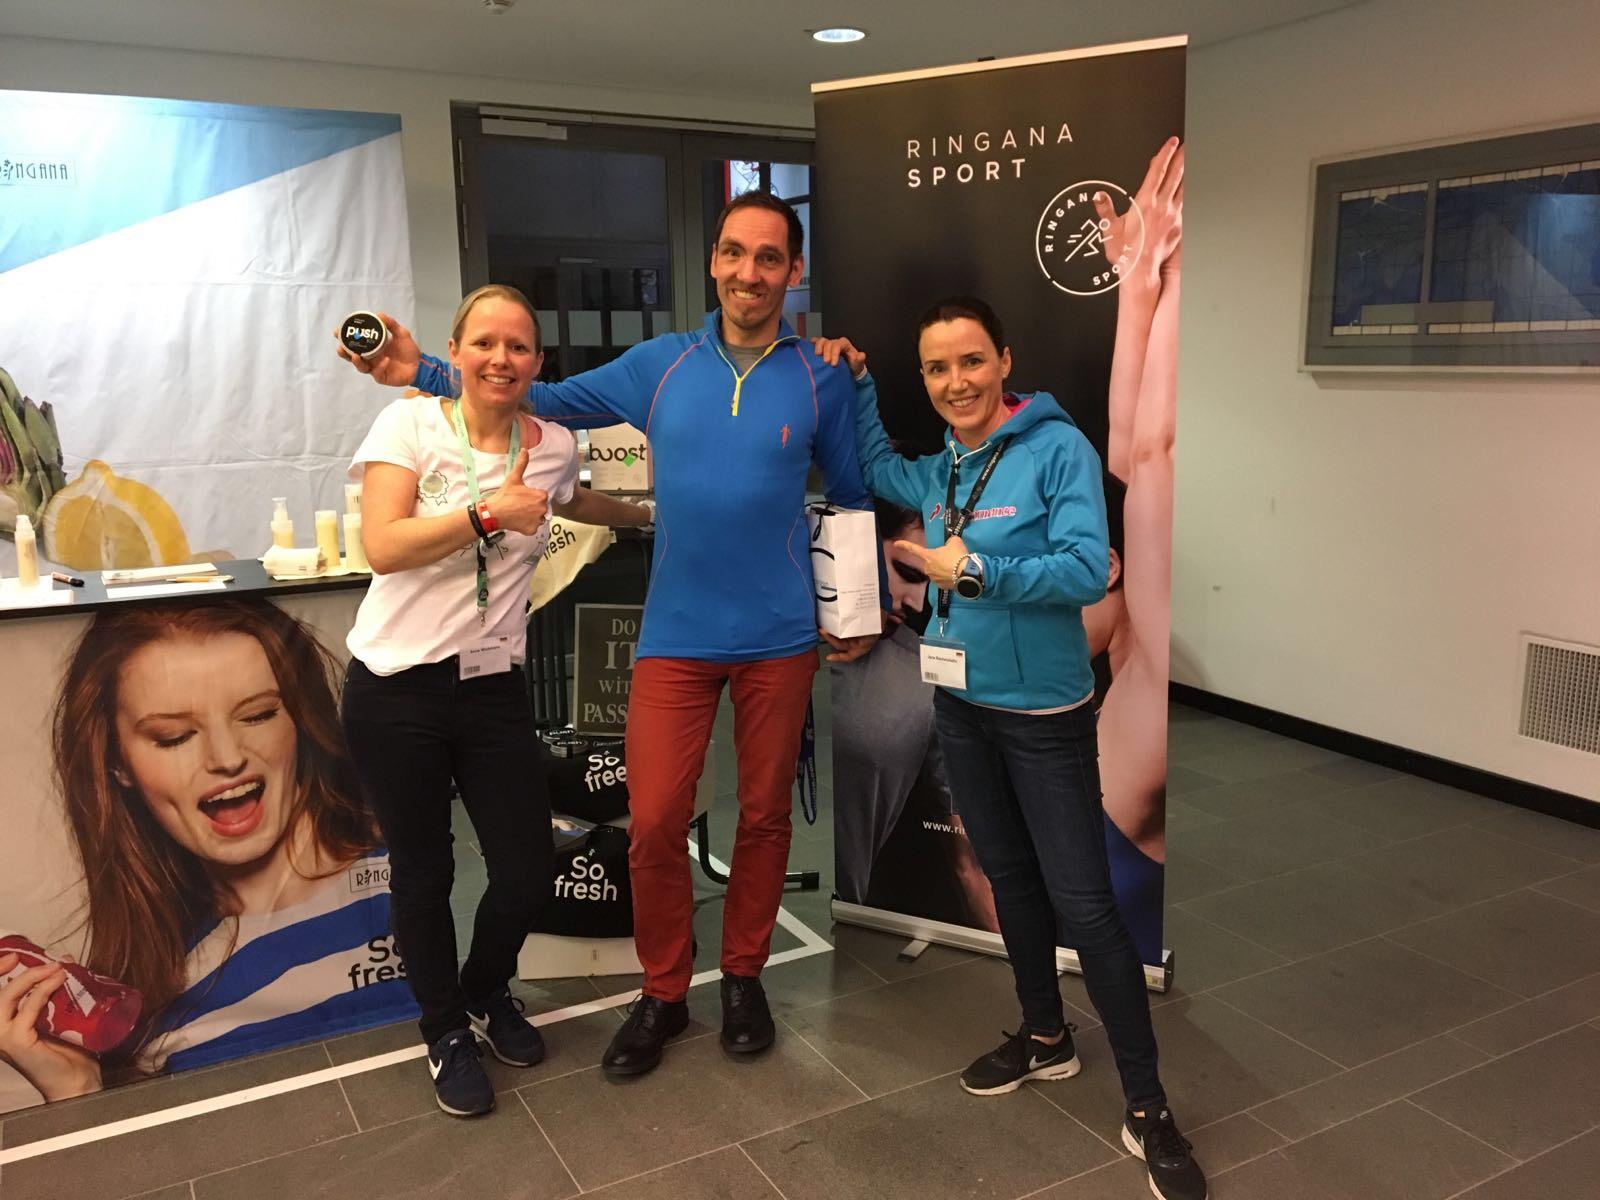 rigana_sport